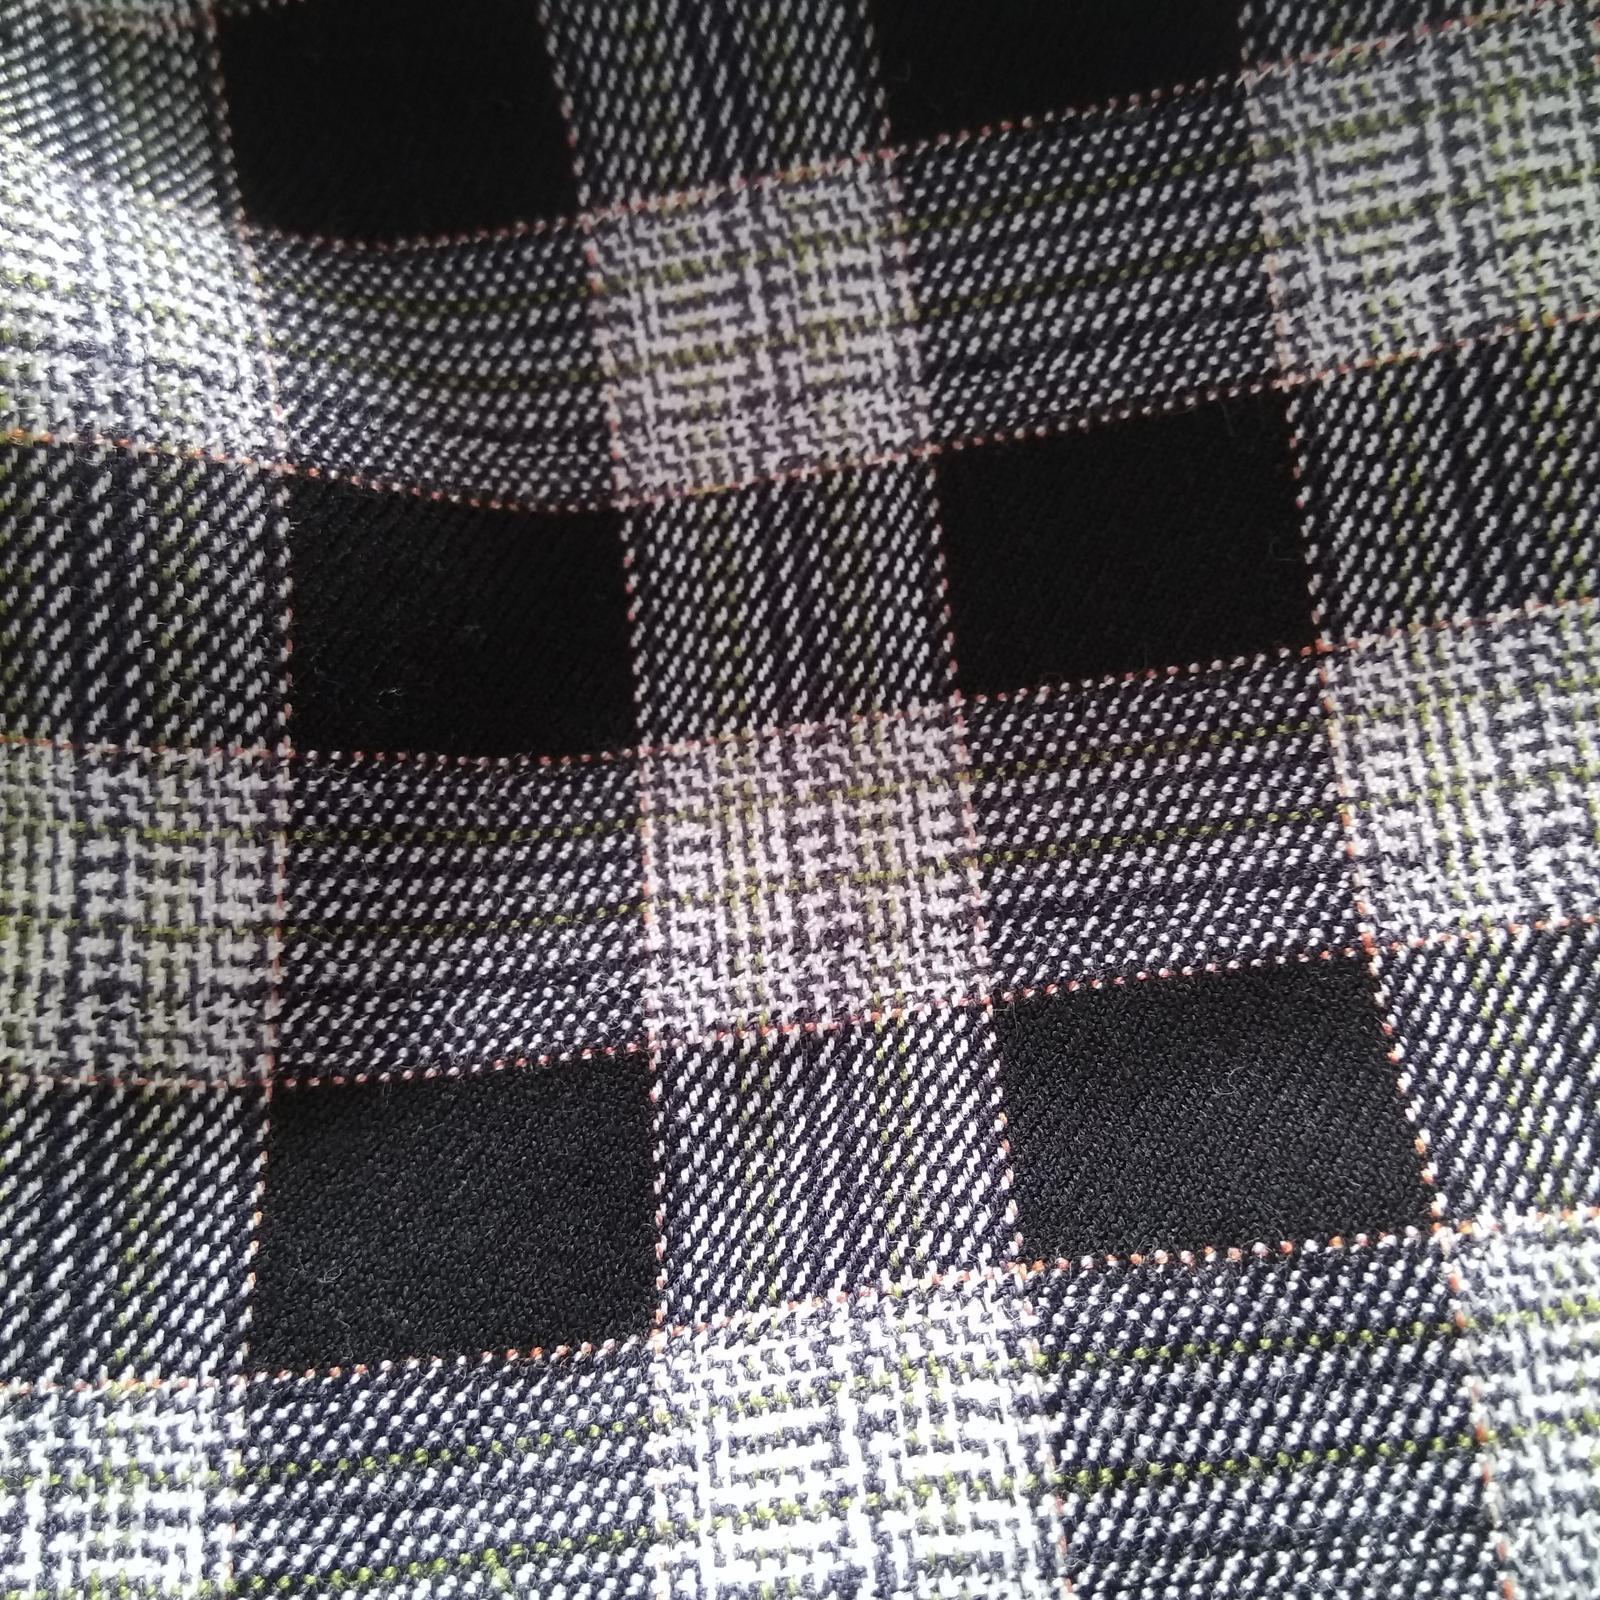 Krátka úzka sukňa - Obrázok č. 3